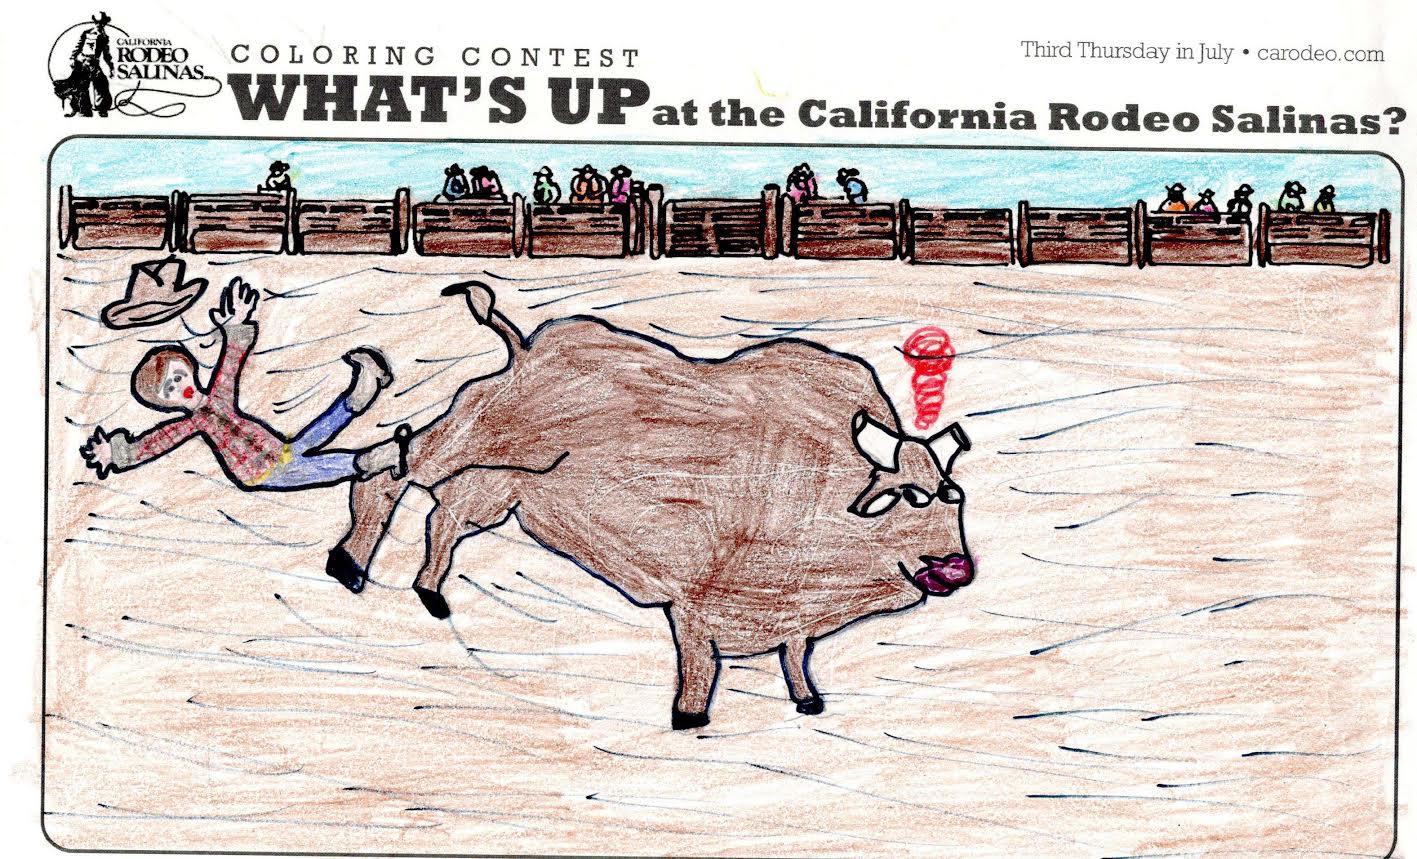 California Rodeo Salinas Coloring Contest